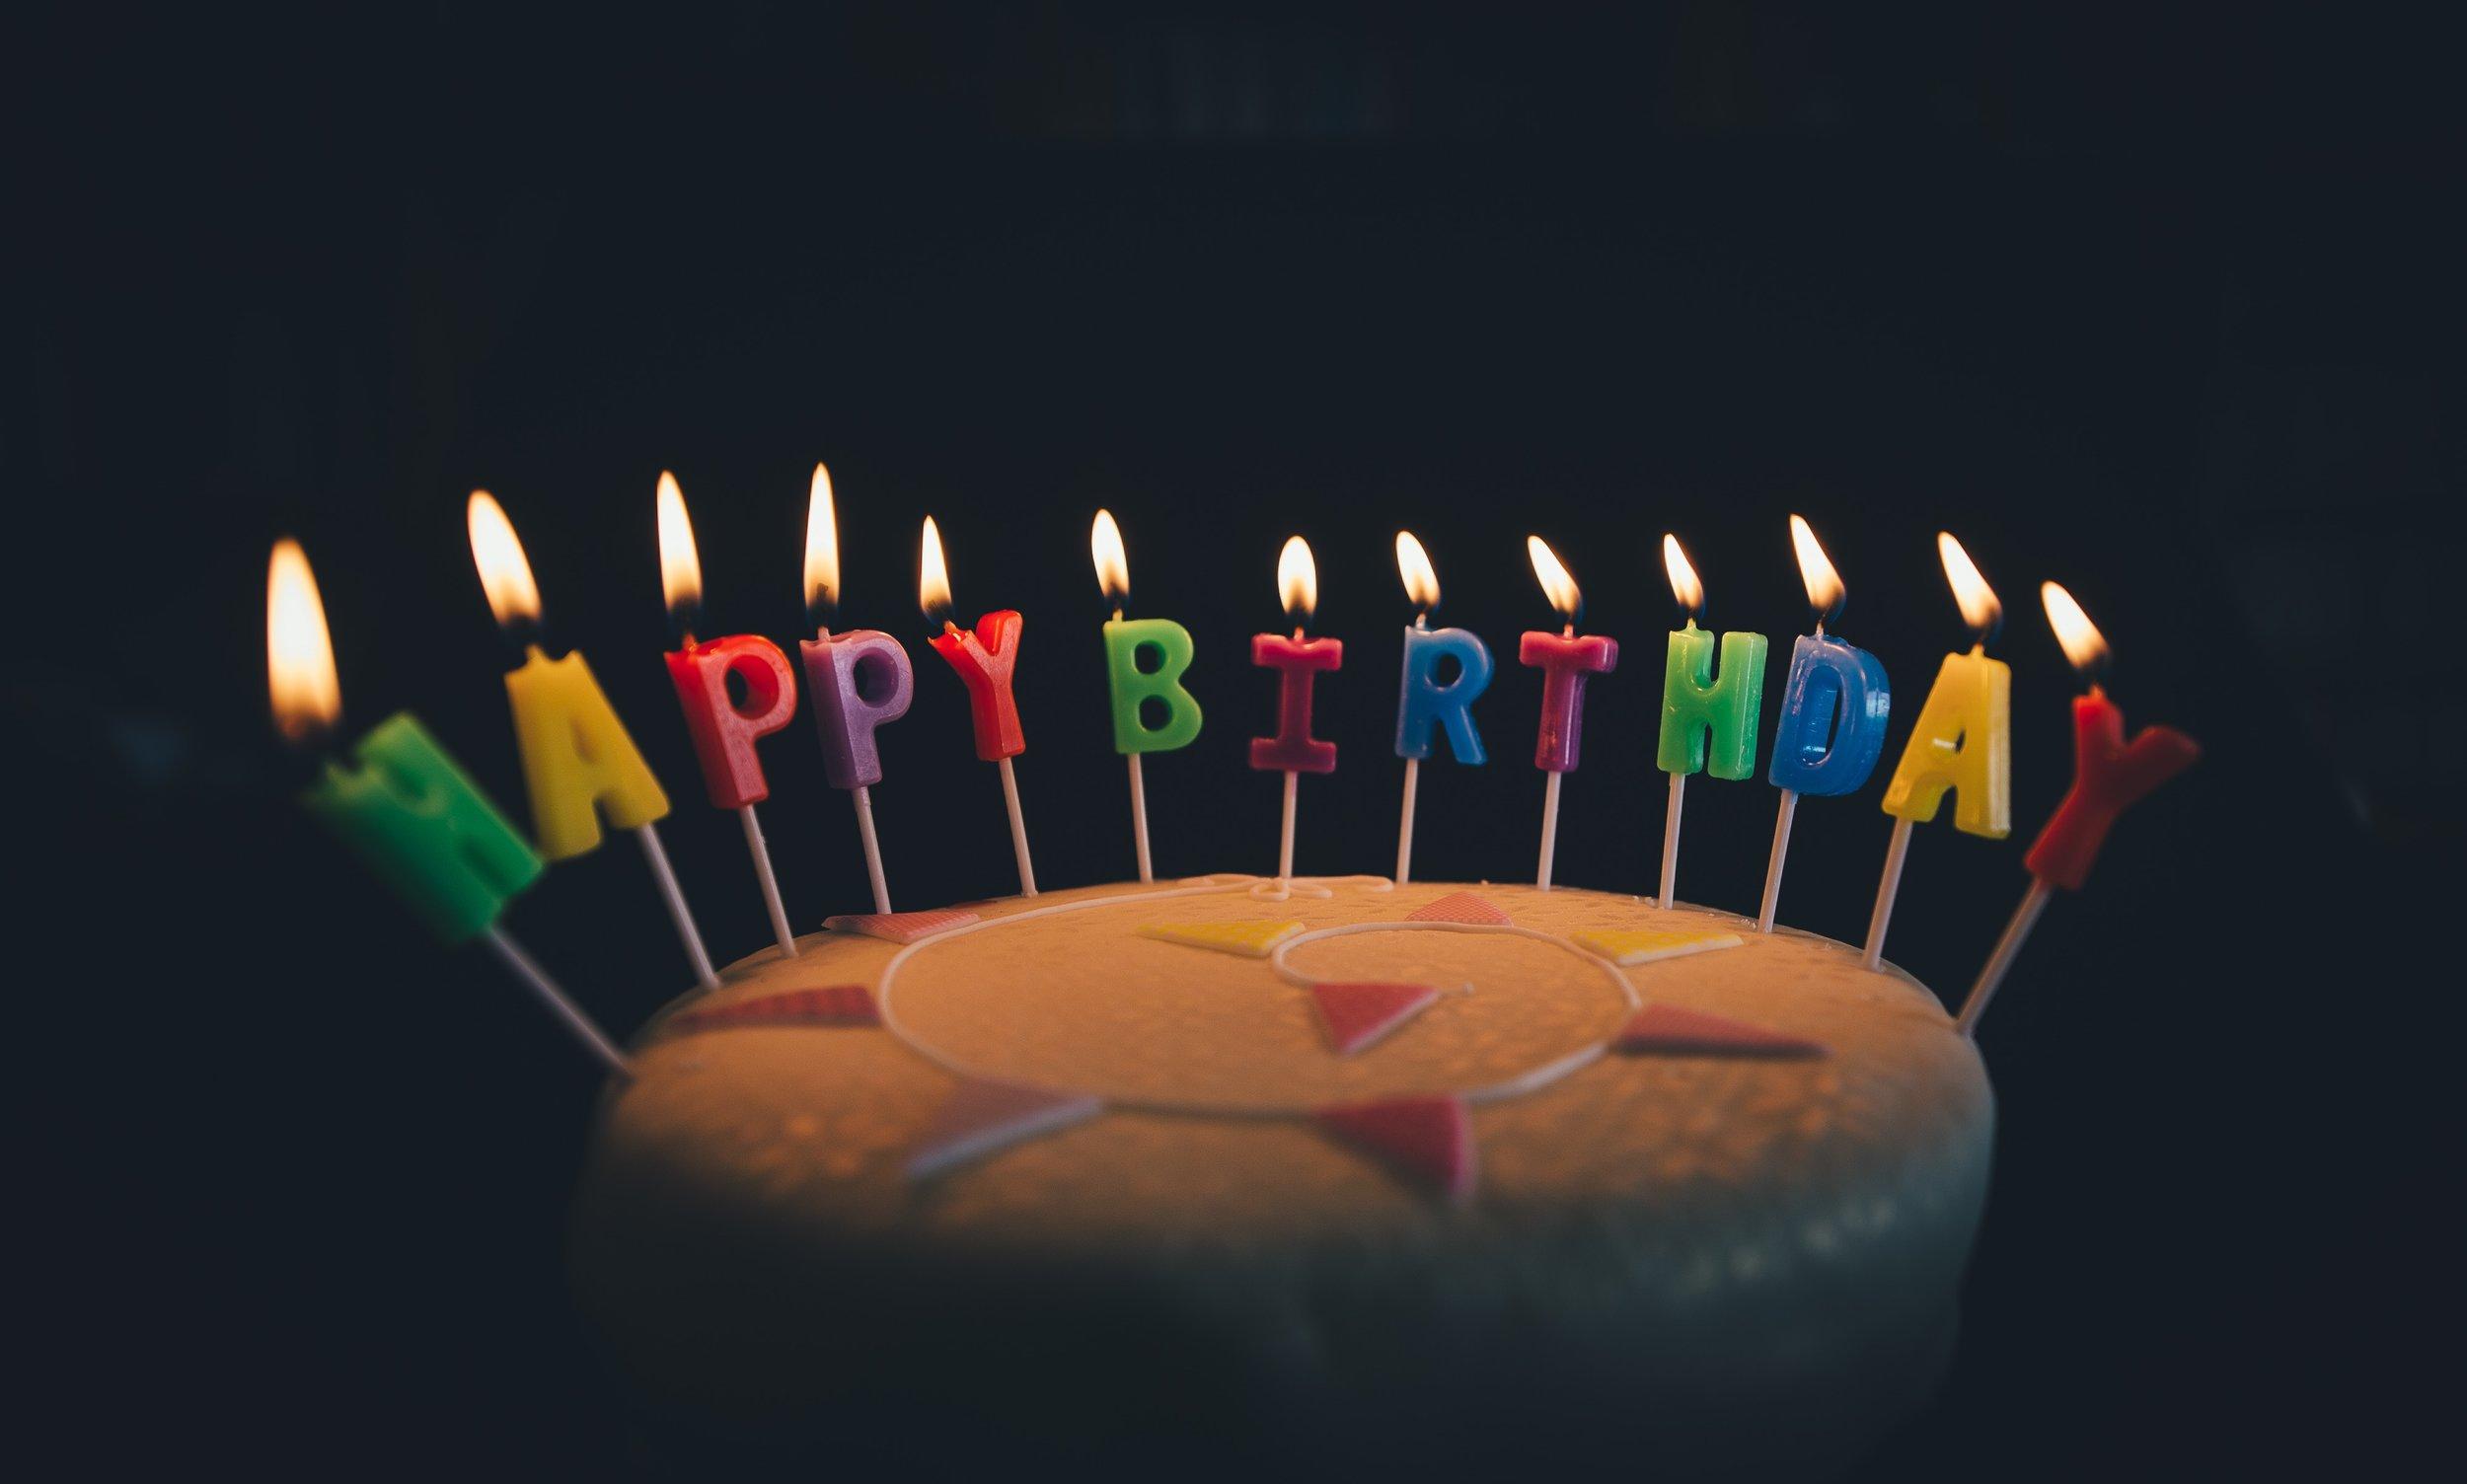 Happy Birthday istock.jpg